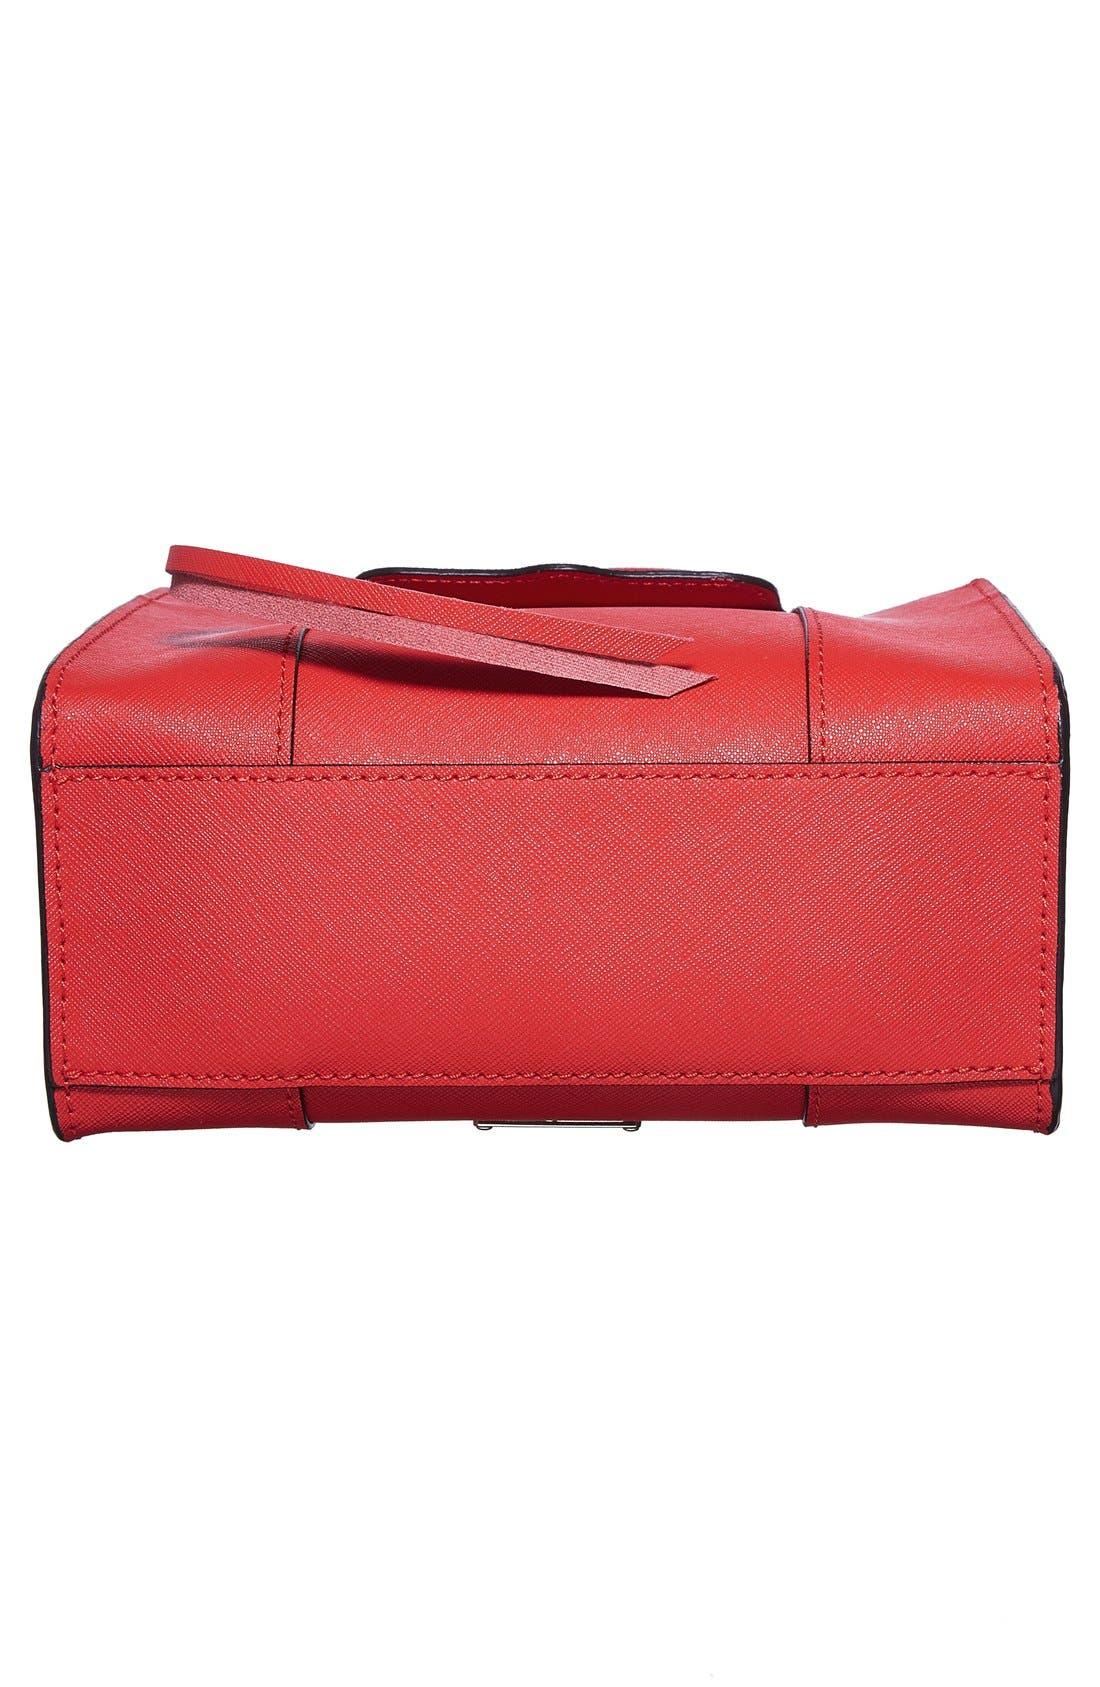 ,                             'Mini MAB Tote' Crossbody Bag,                             Alternate thumbnail 92, color,                             606